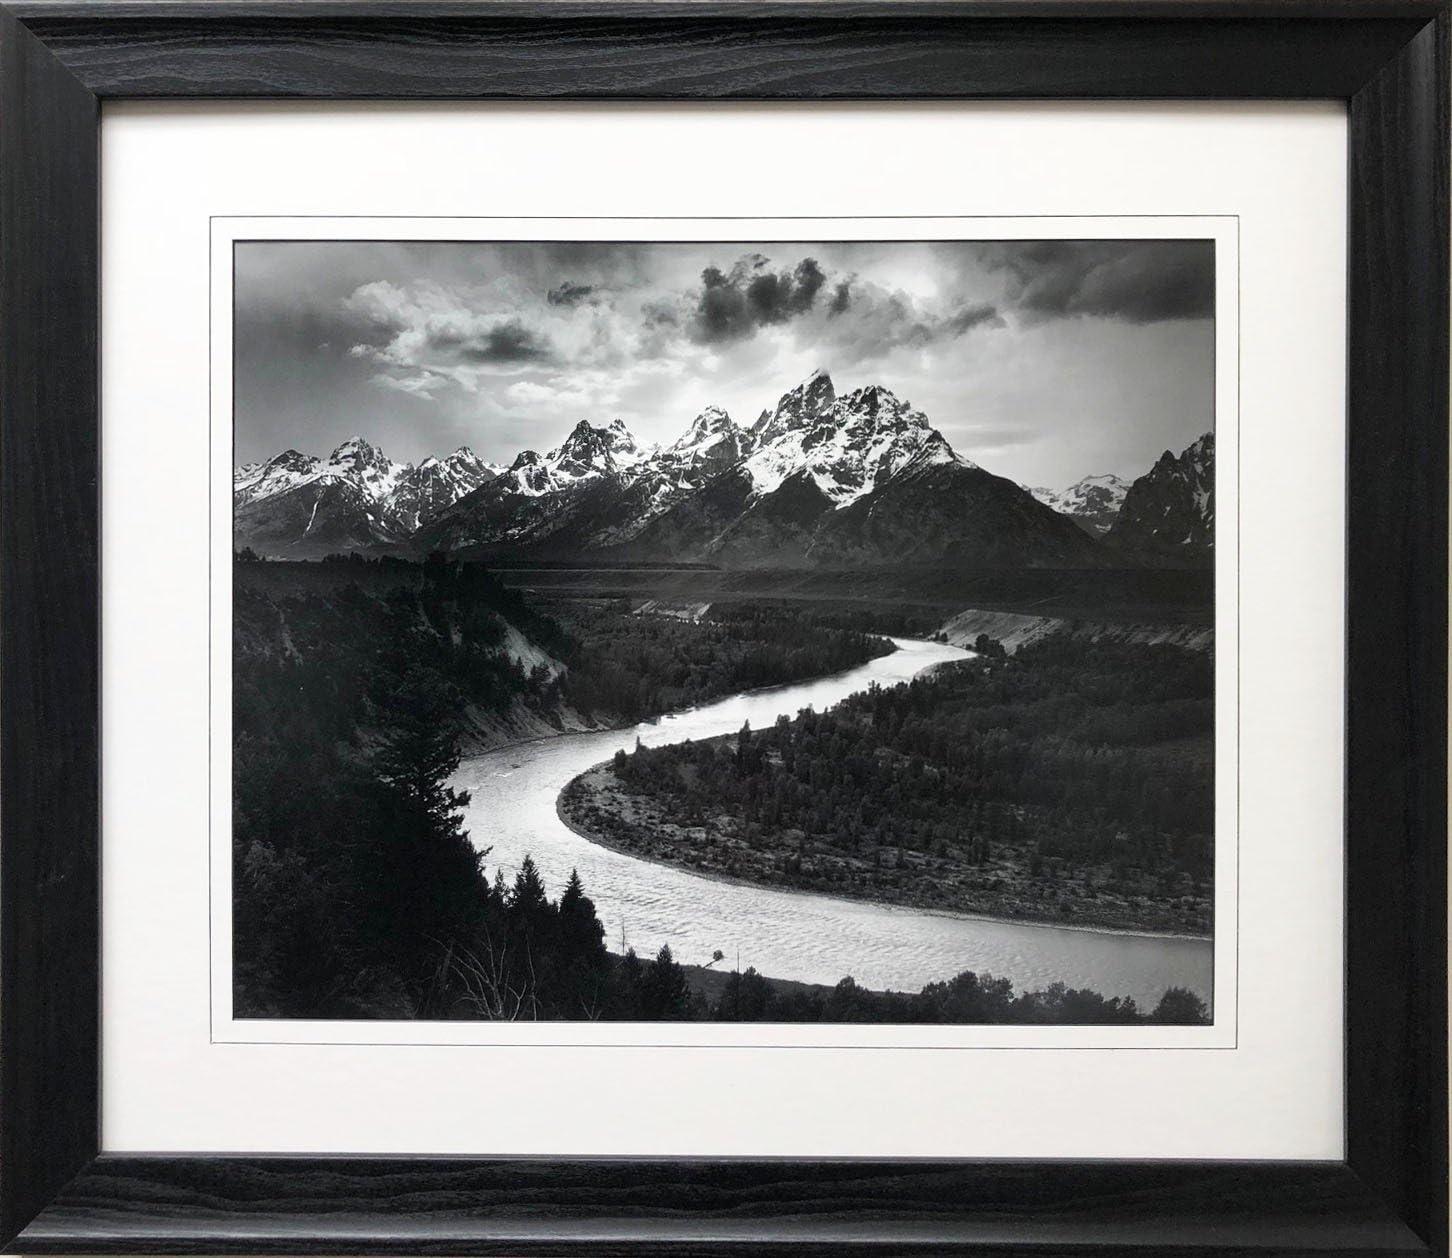 Ansel Adams B//W Photo The Tetons Snake River #2 Wall Picture 8x10 Art Print